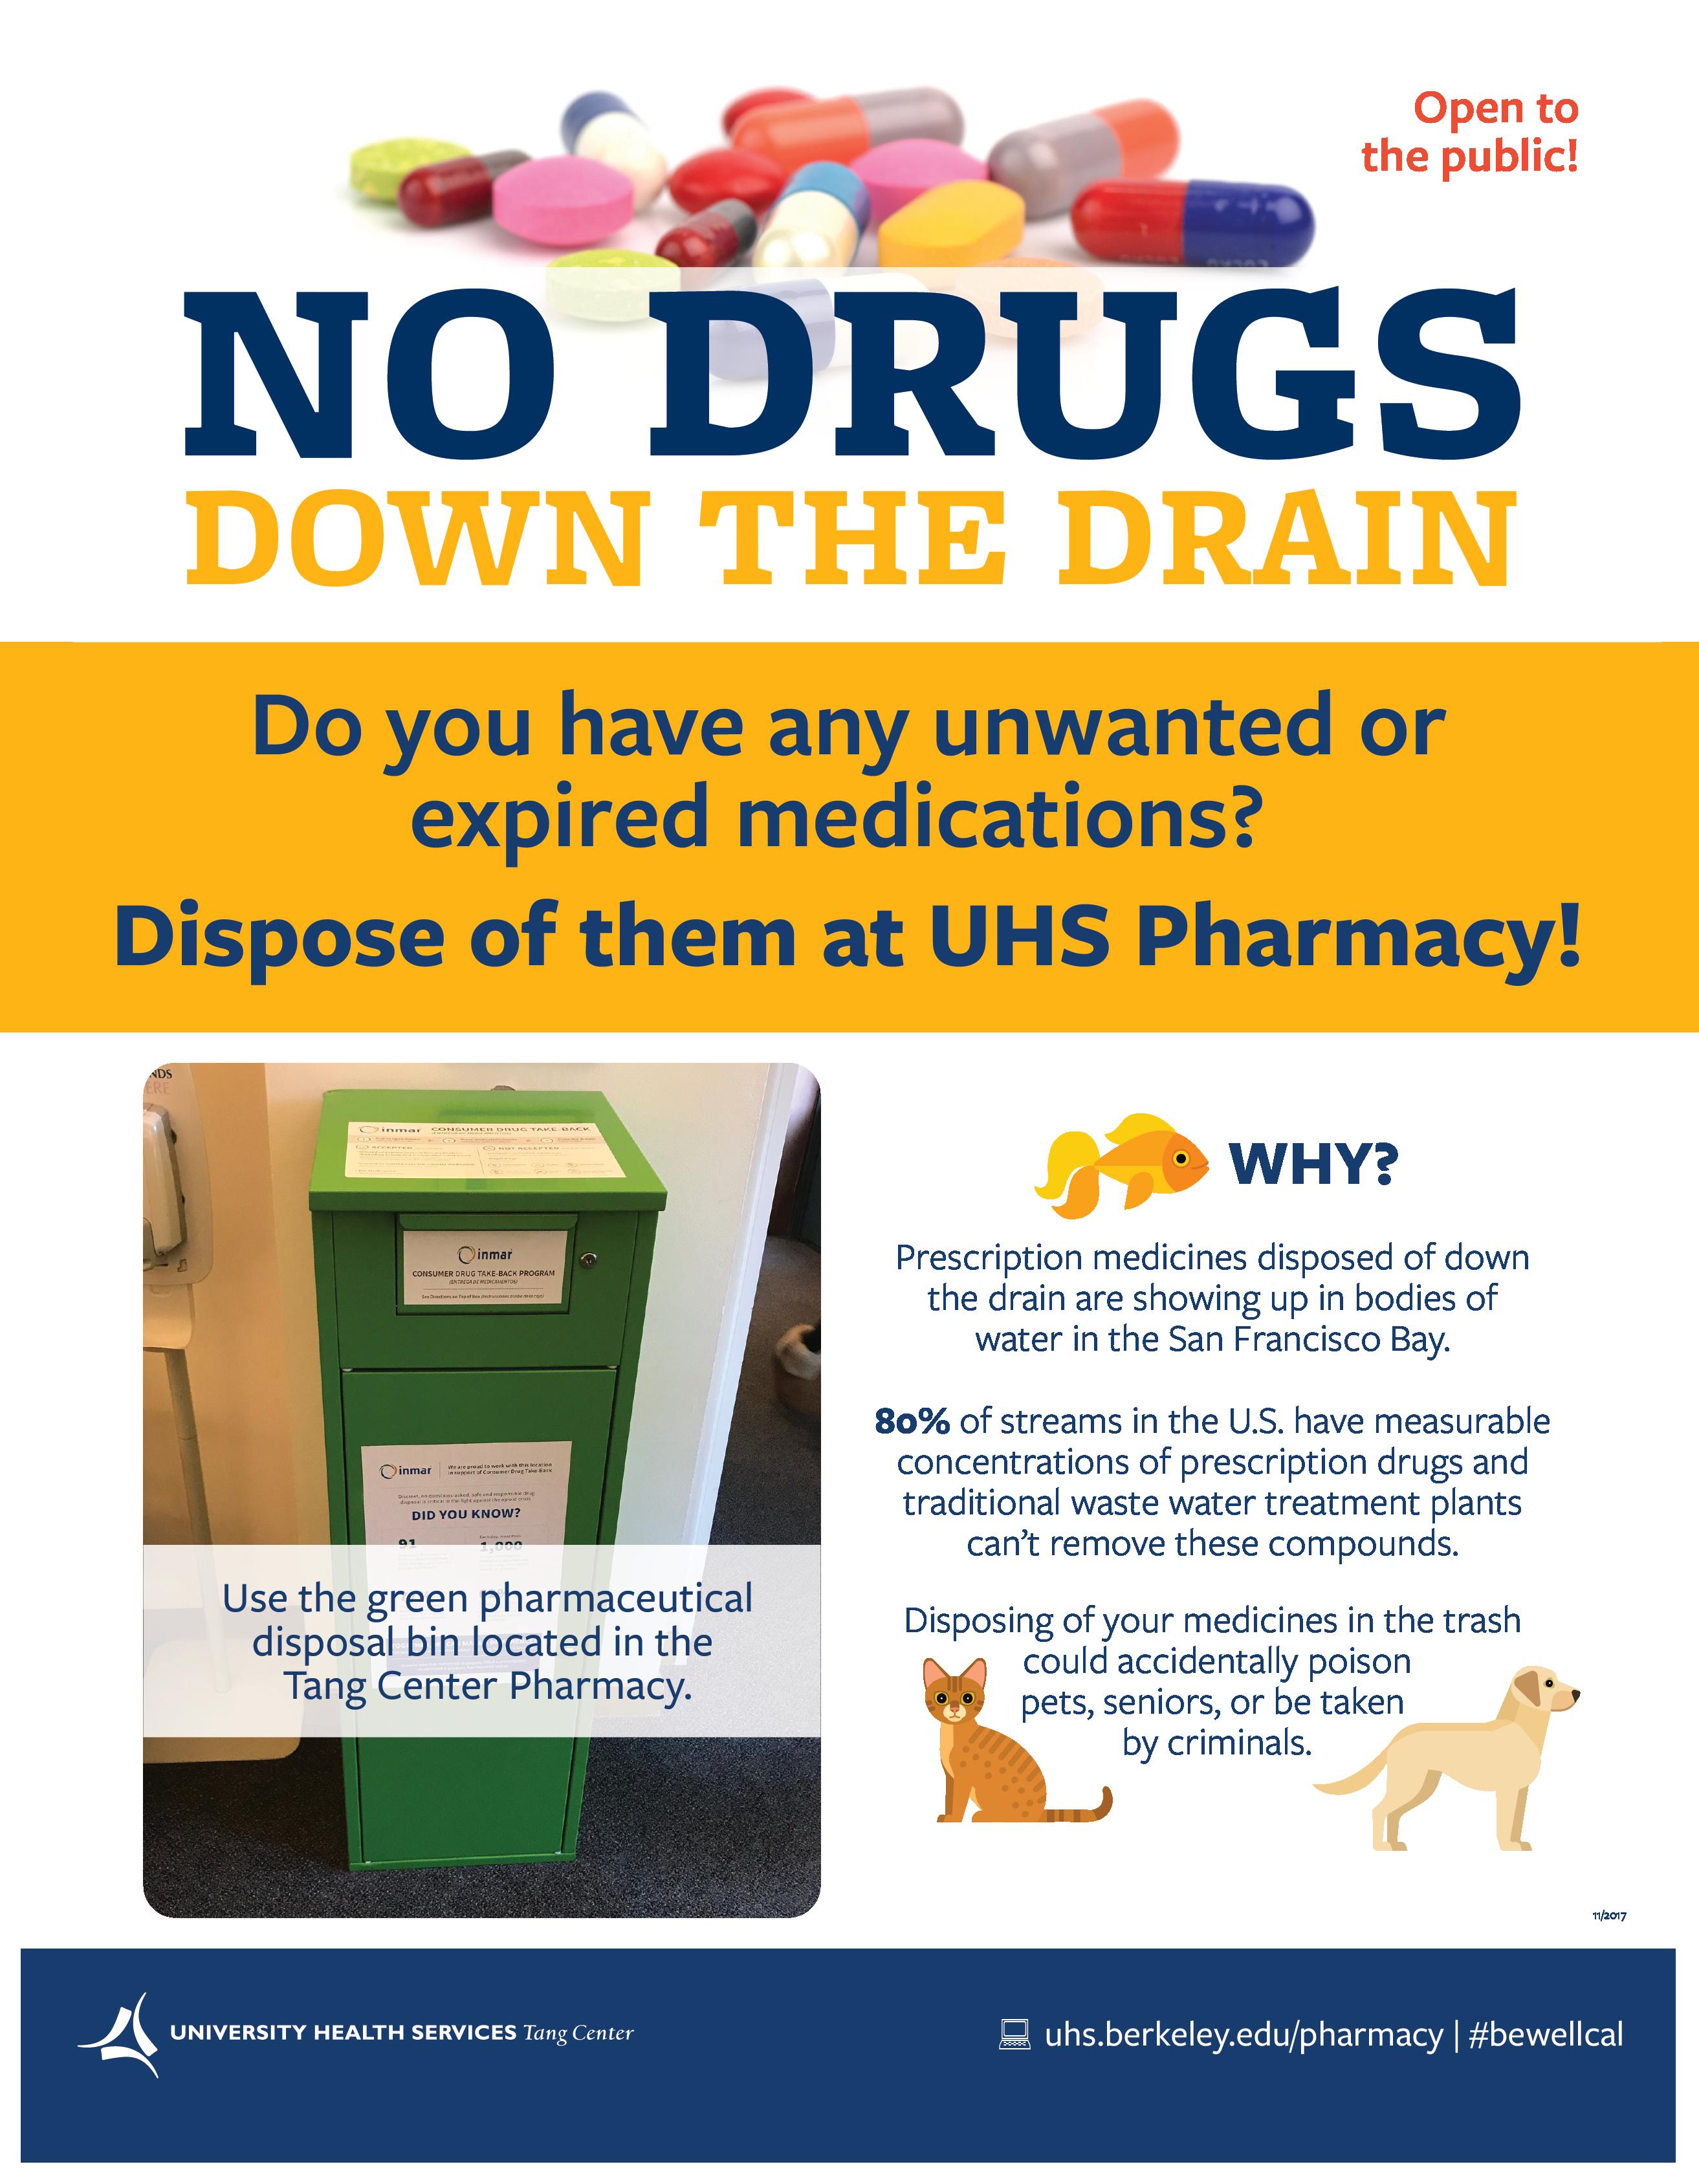 Pharmacy Disposal Bin photo